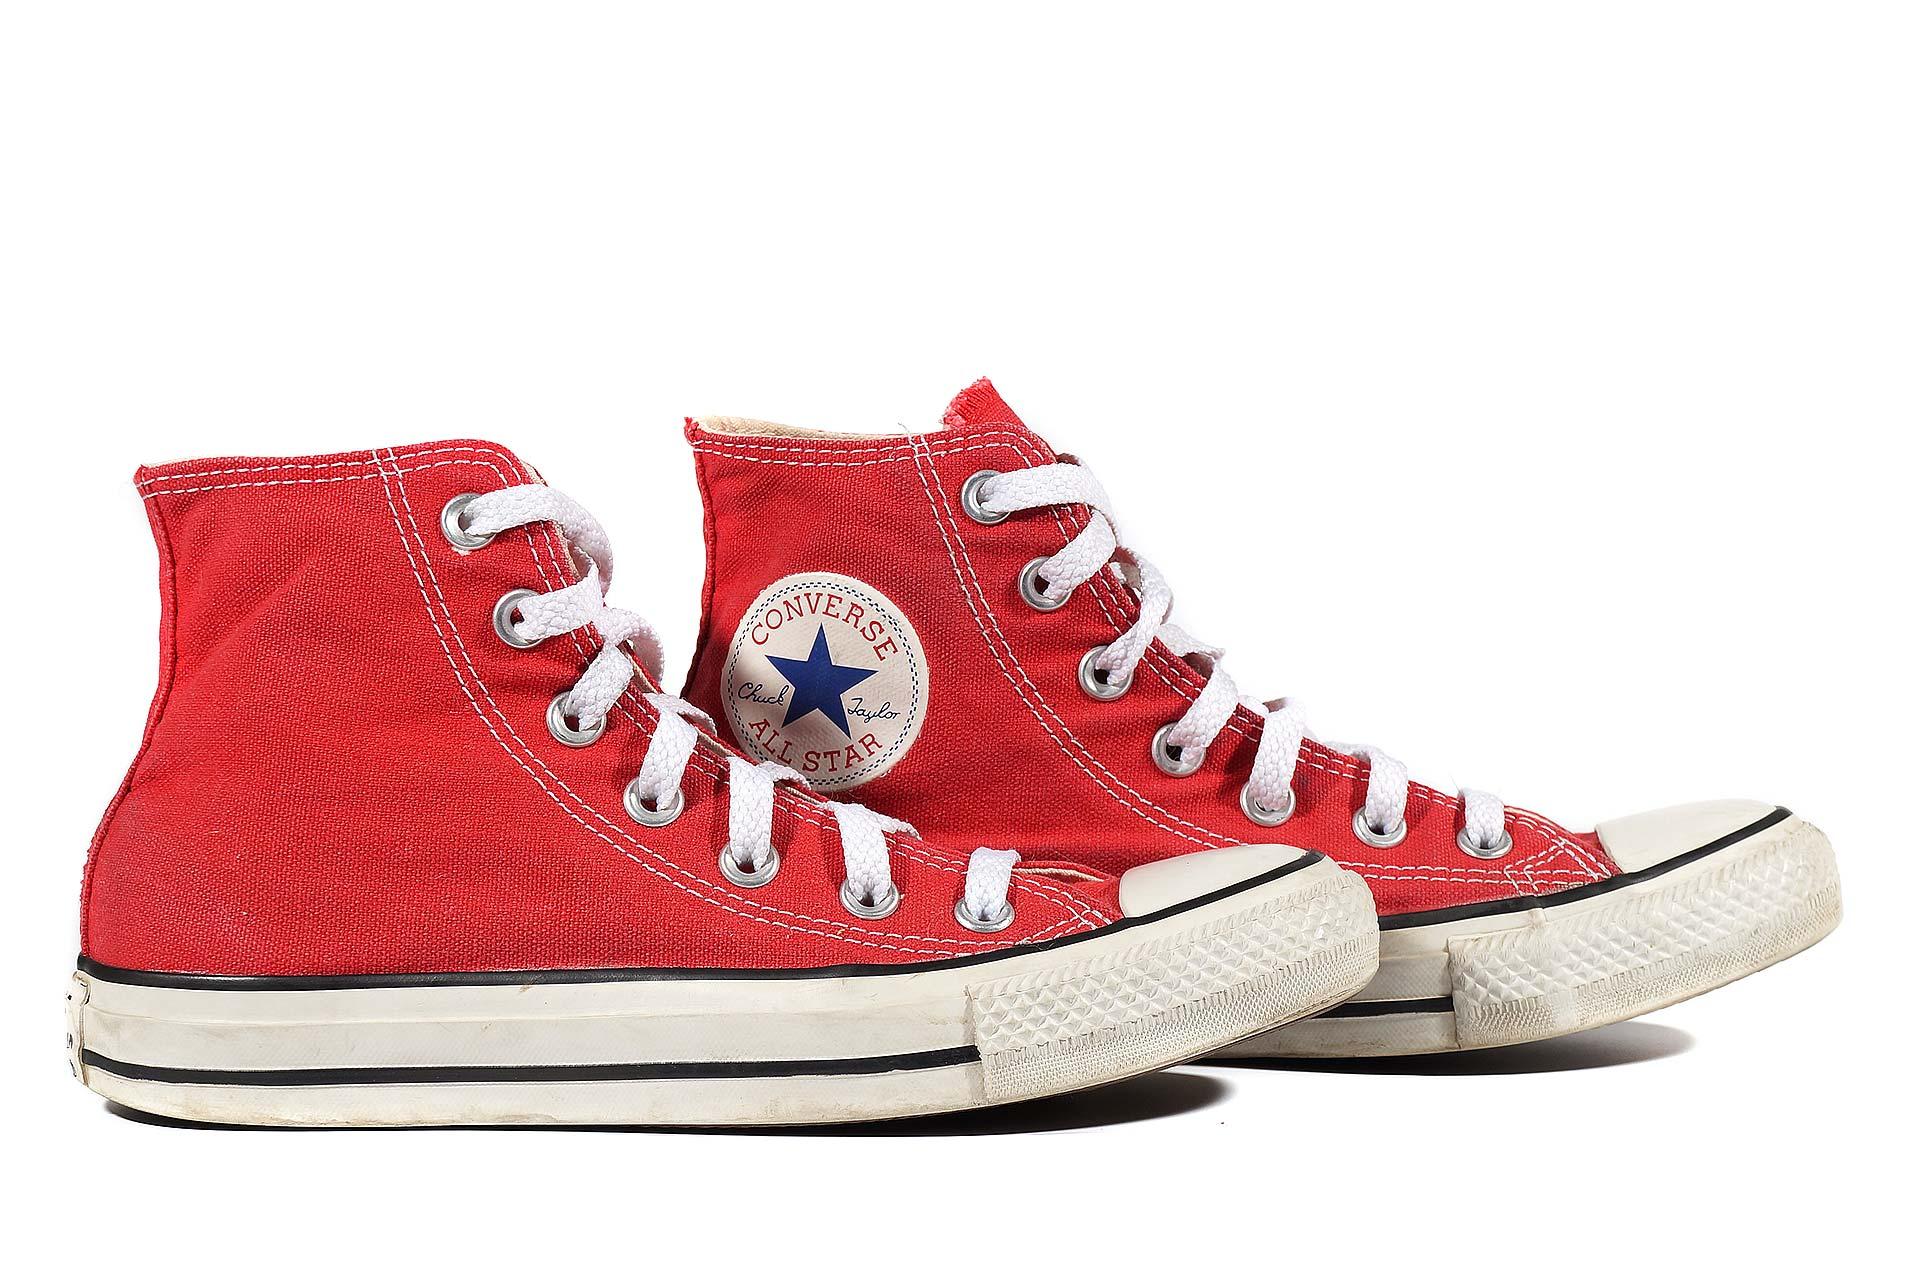 3f6d5c9aeb5e Converse Chuck Taylor All Star M9621 (00036-U) sneakers used buy ...